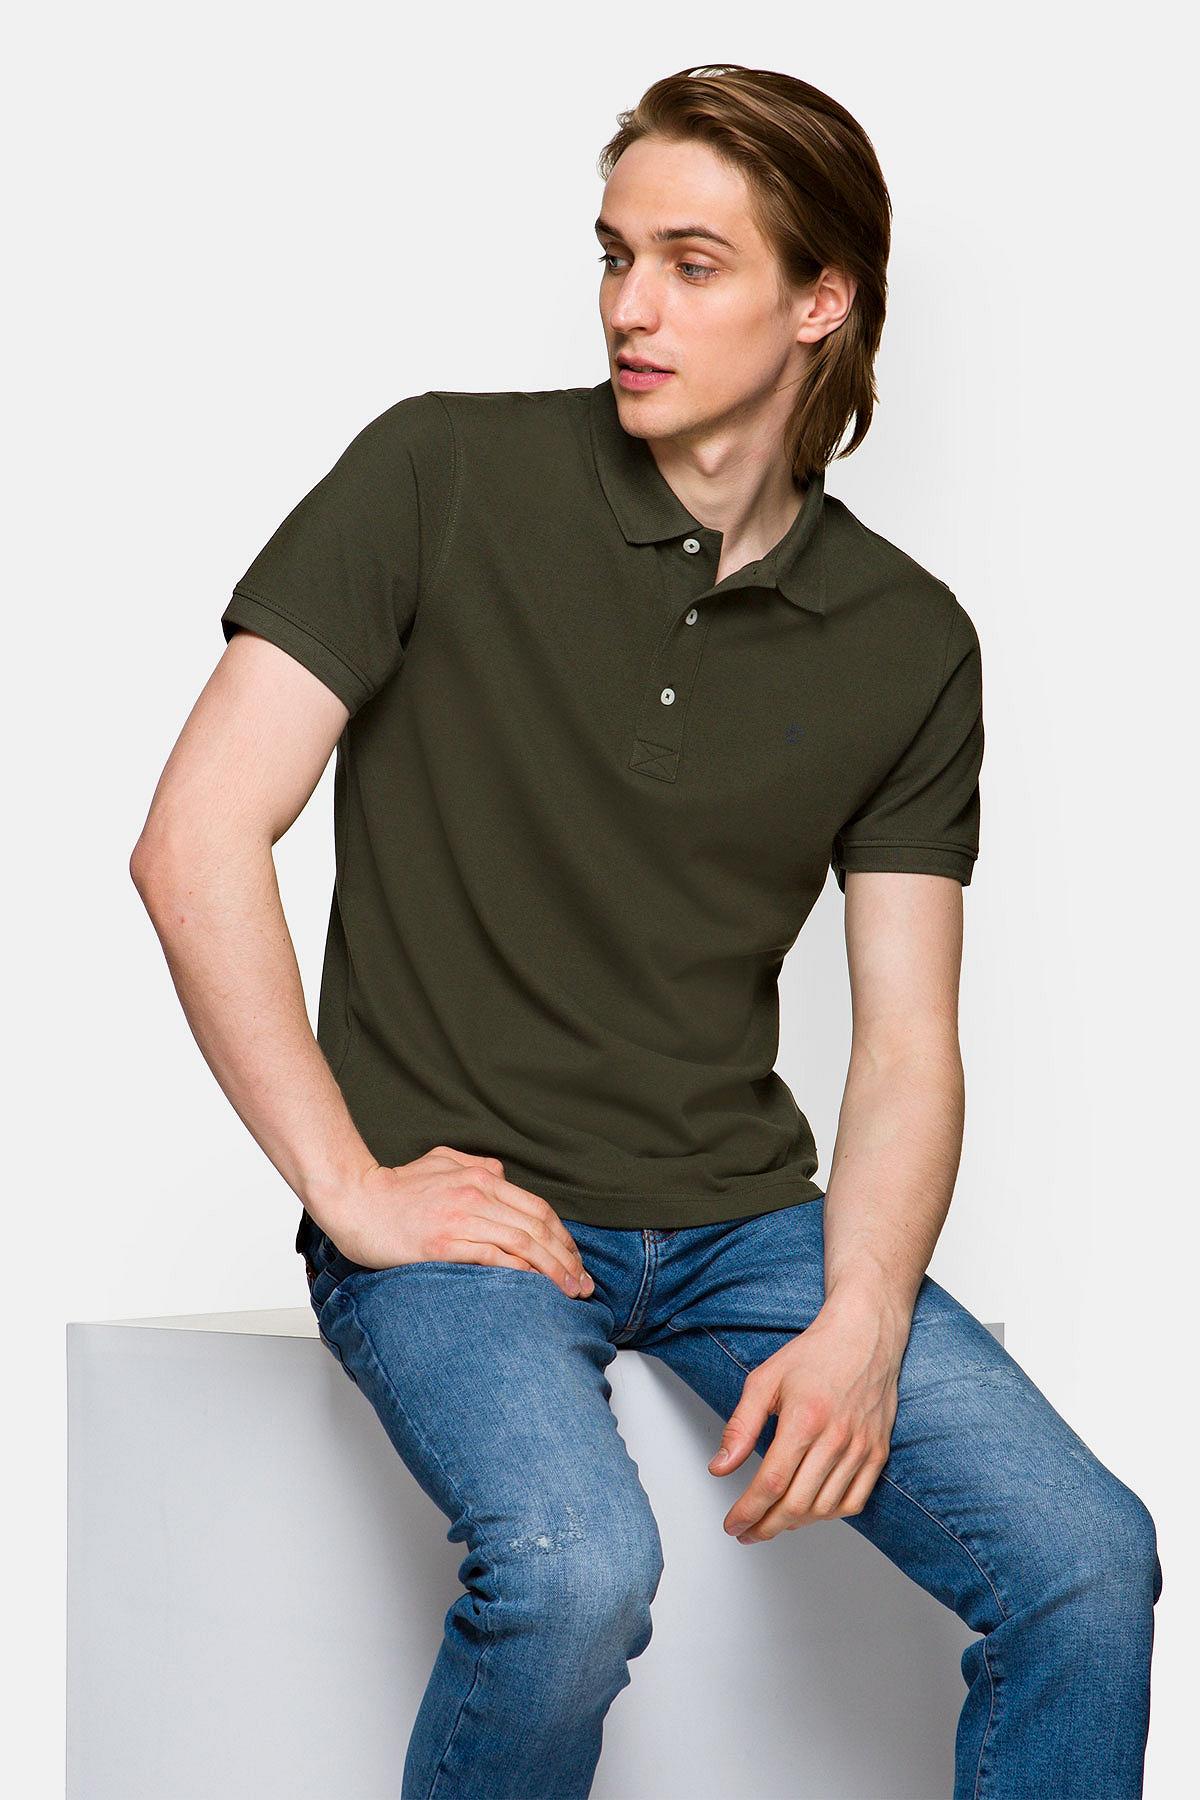 Koszulka Ciemnozielona Polo Patrick rozmiar 2XL; 3XL; 4XL; 5XL; L; M; XL